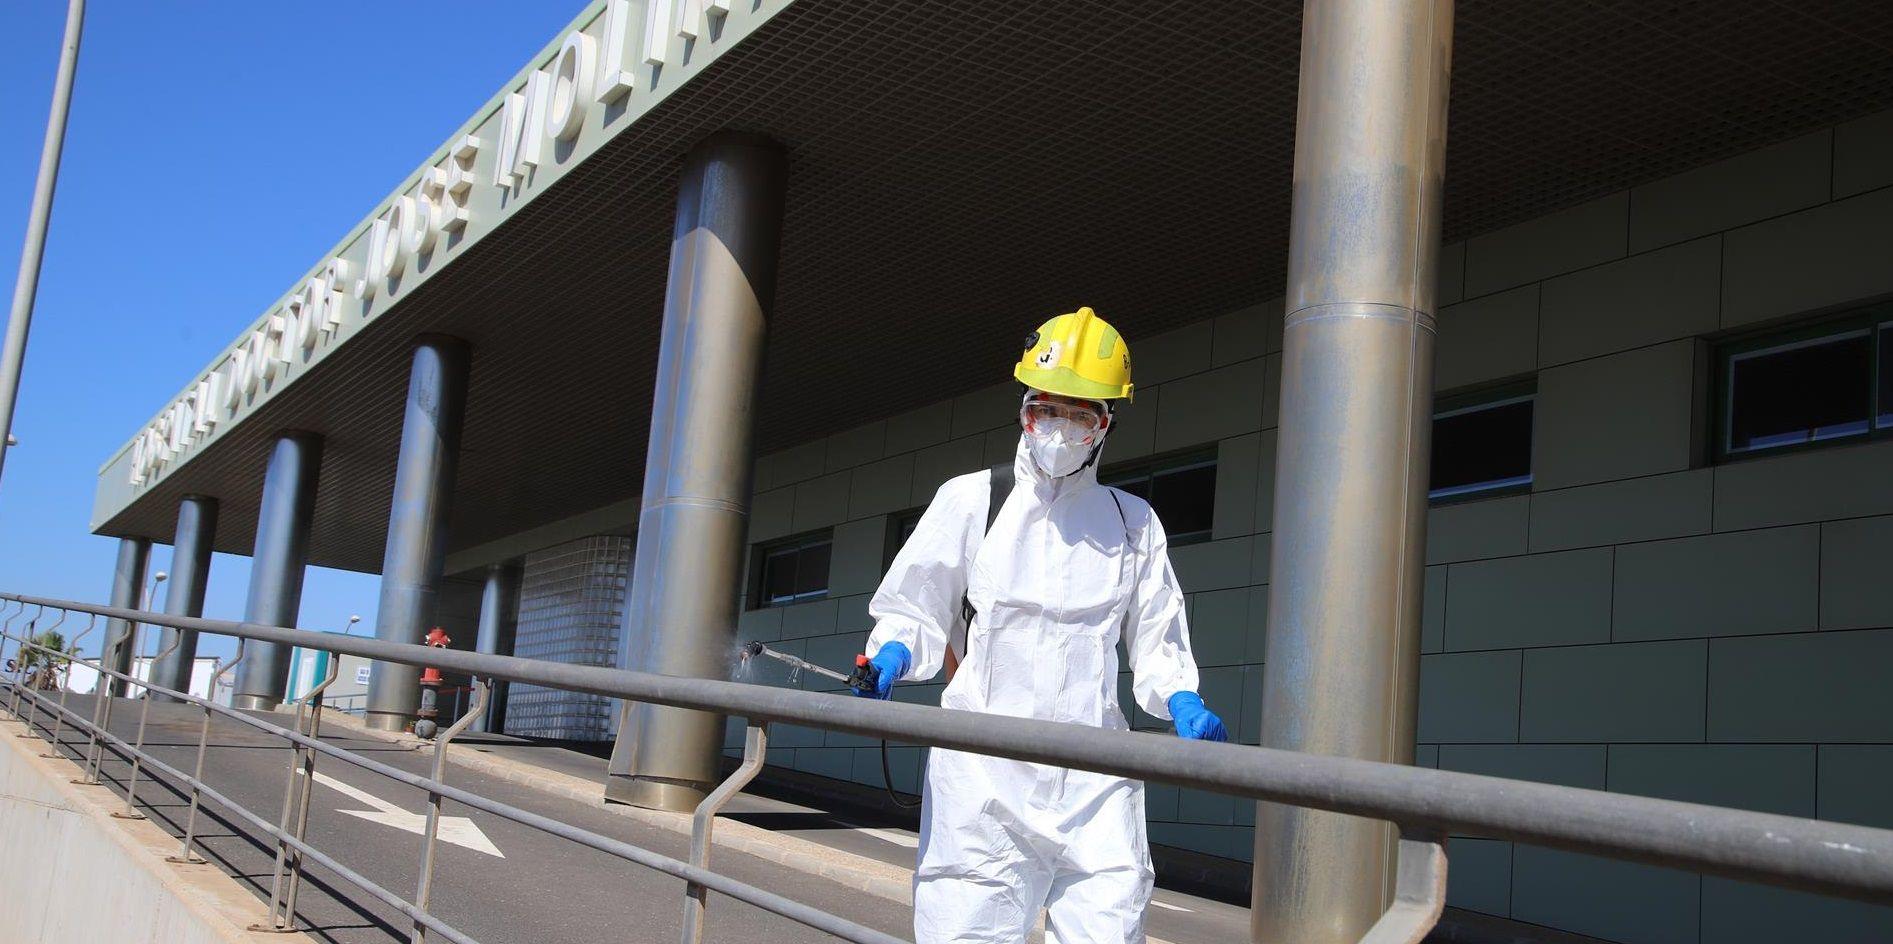 Desinfeción Hospital Dr. Molina Orosa. Lanzarote